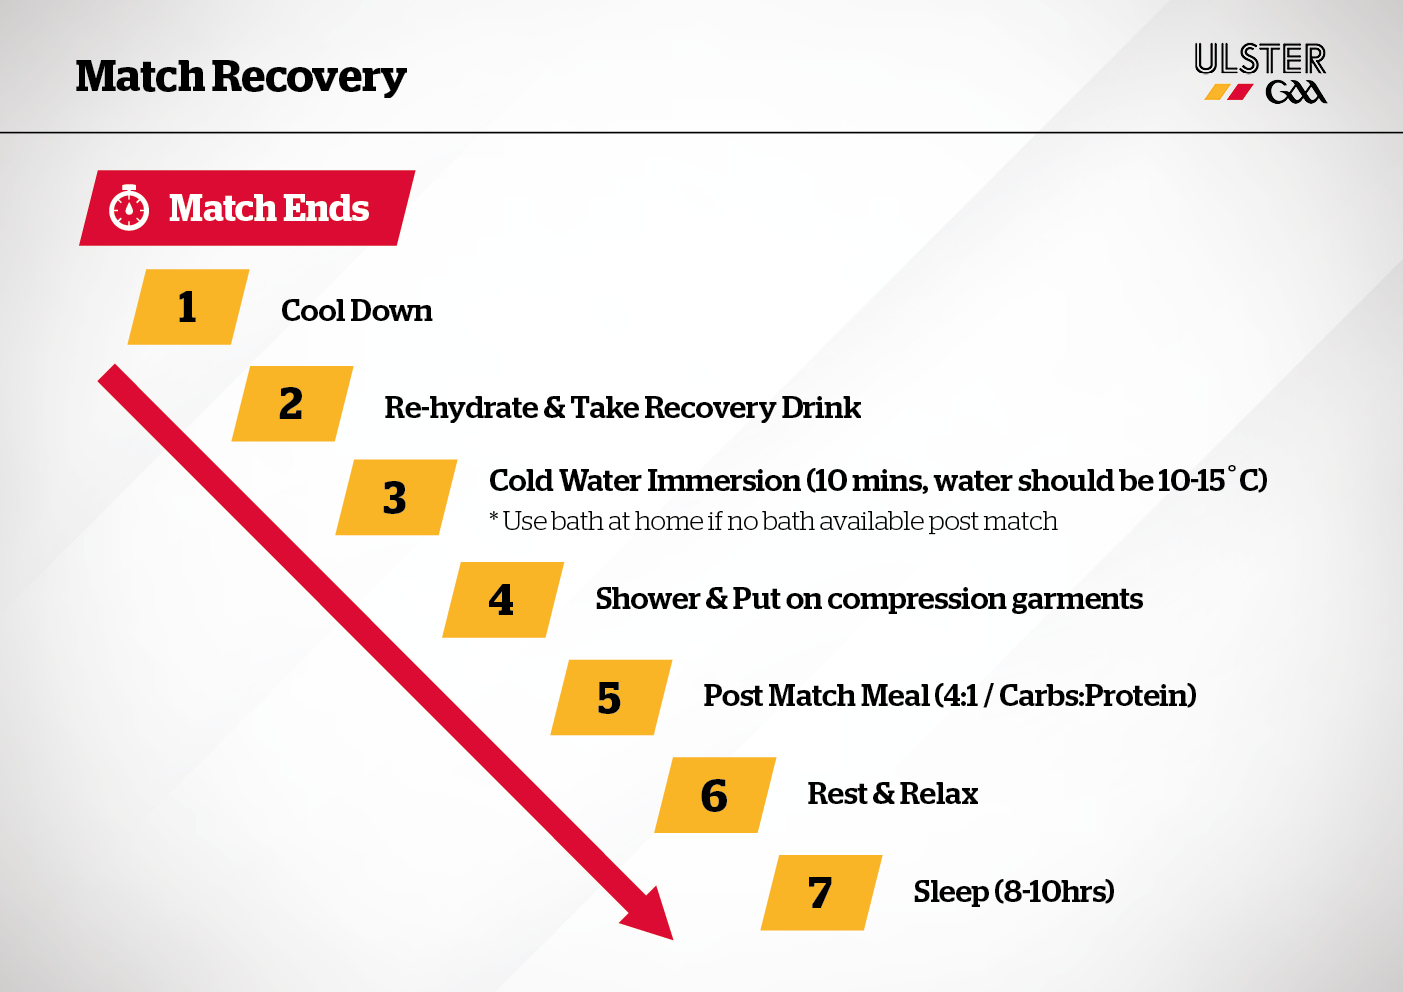 Match Recovery Protocol